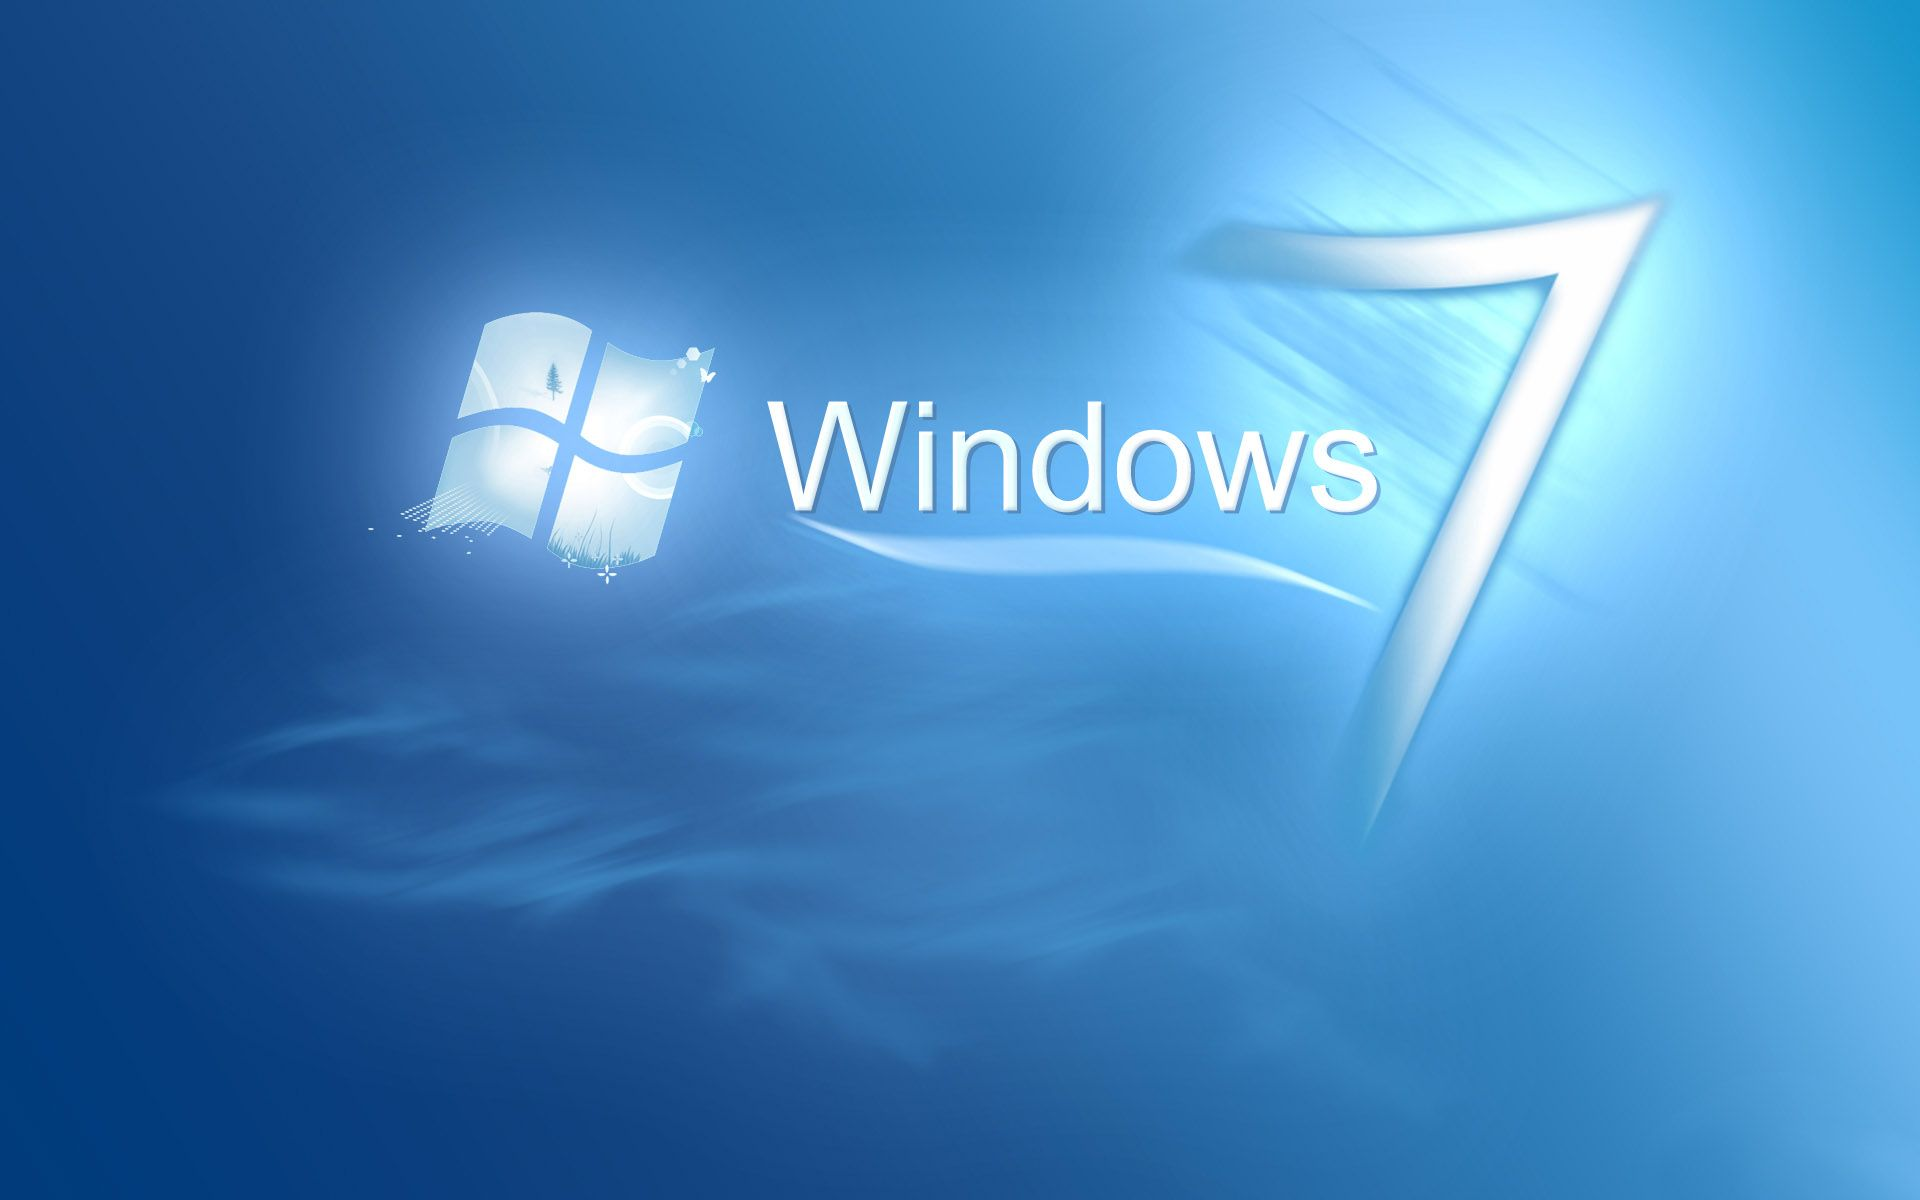 47+ C Windows Web Wallpaper on WallpaperSafari